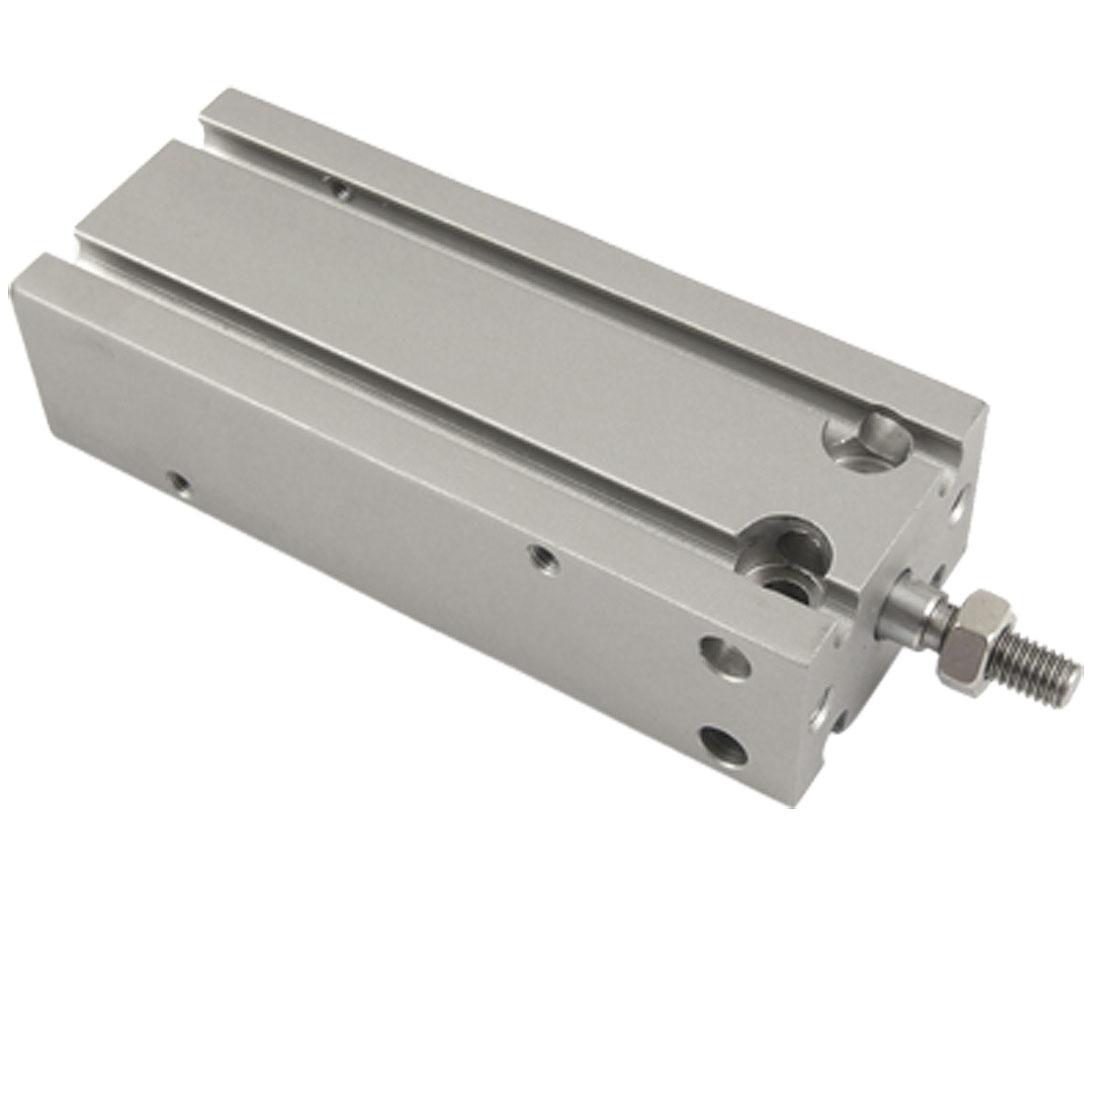 Silver Tone 16mm Bore Pneumatic Air Cylinder CDU16-40